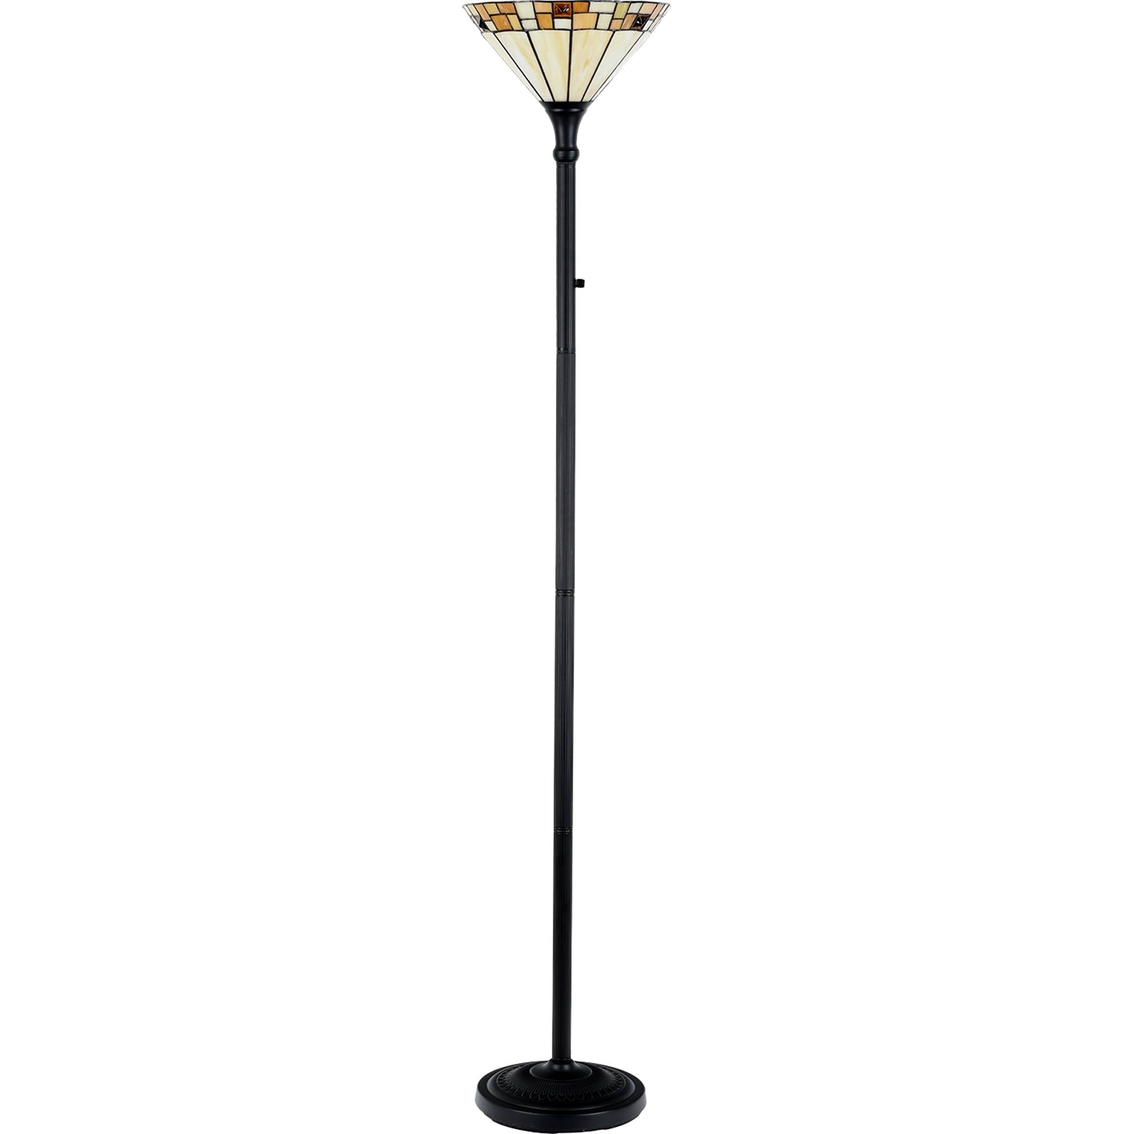 dale tiffany sundance led torchiere floor lamp floor lamps home. Black Bedroom Furniture Sets. Home Design Ideas